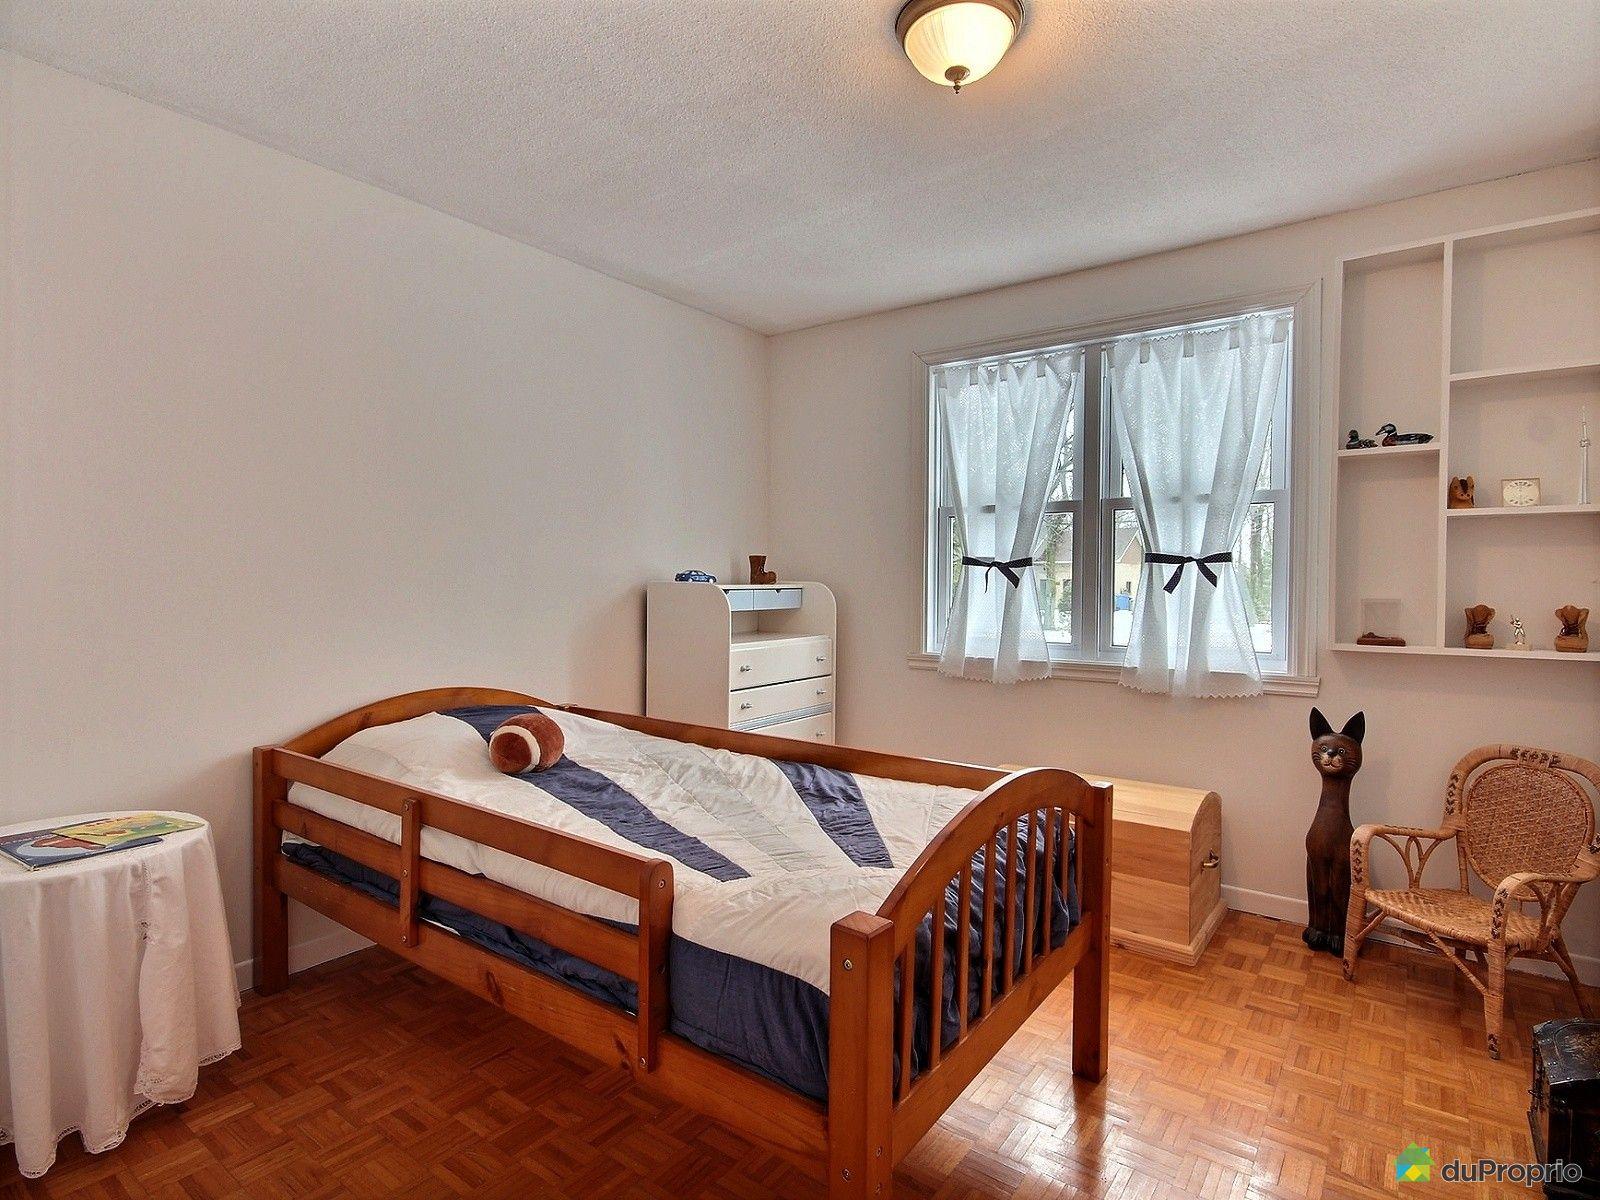 Maison vendre granby 726 rue chaput immobilier qu bec for Chambre commerce granby